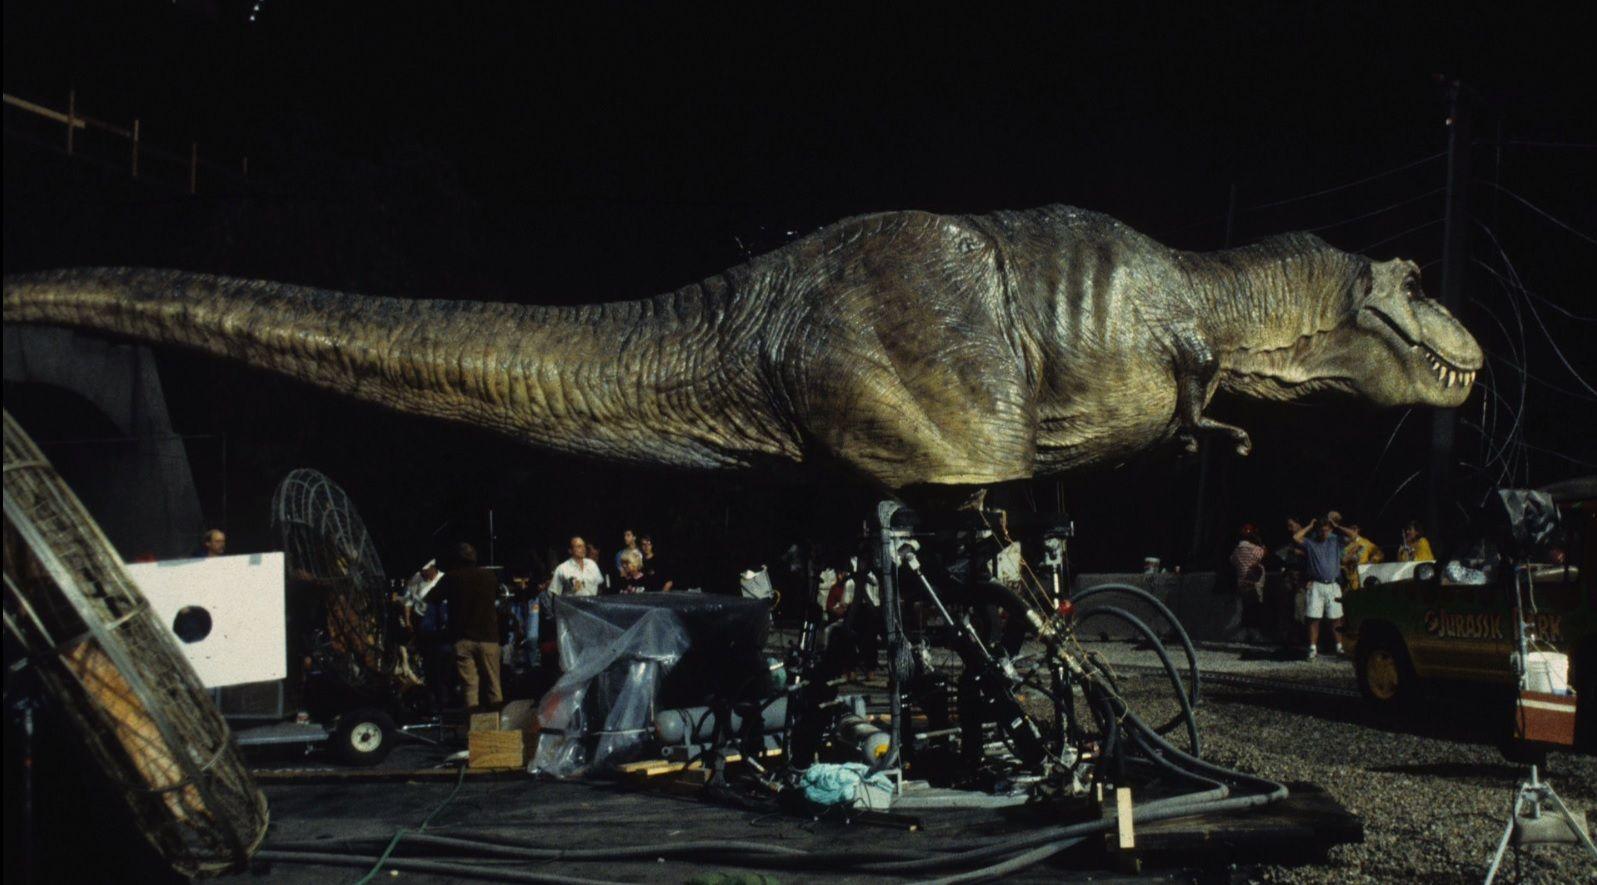 T Rex On The Set Of Jurassic Park Jurassic Park Film Jurassic Park Jurassic Park World